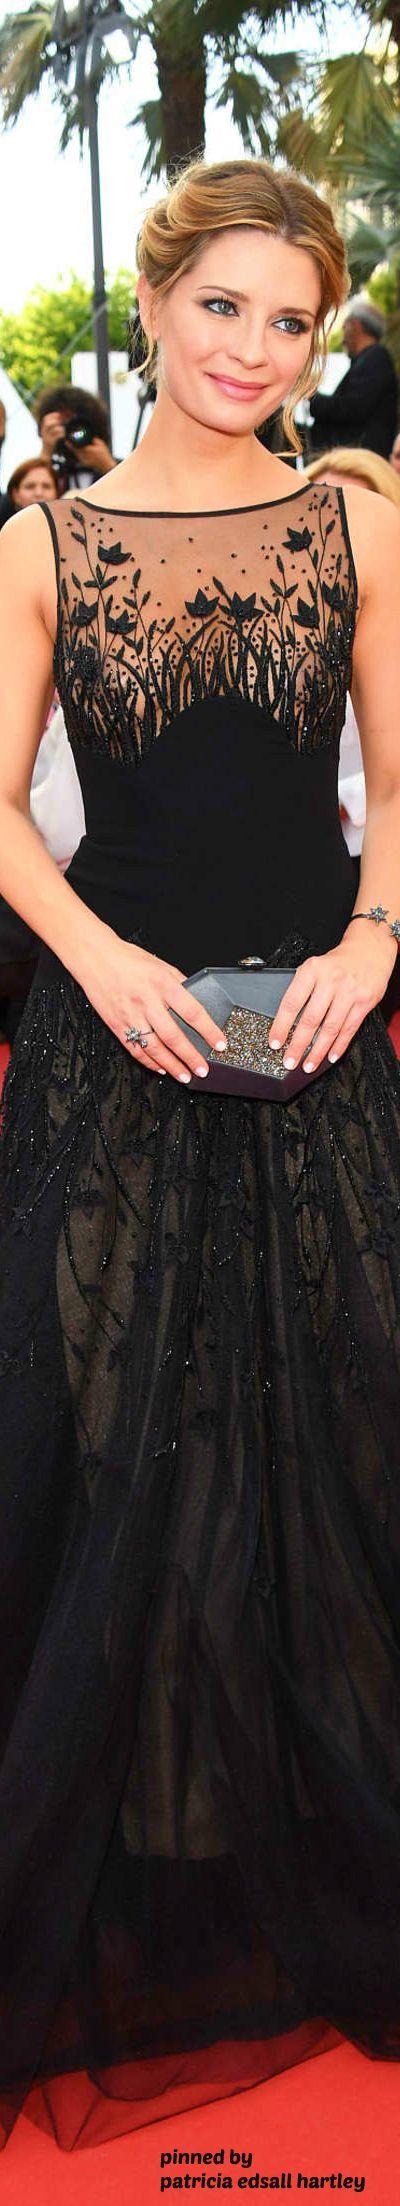 Mischa Barton - 2016 Cannes Film Festival